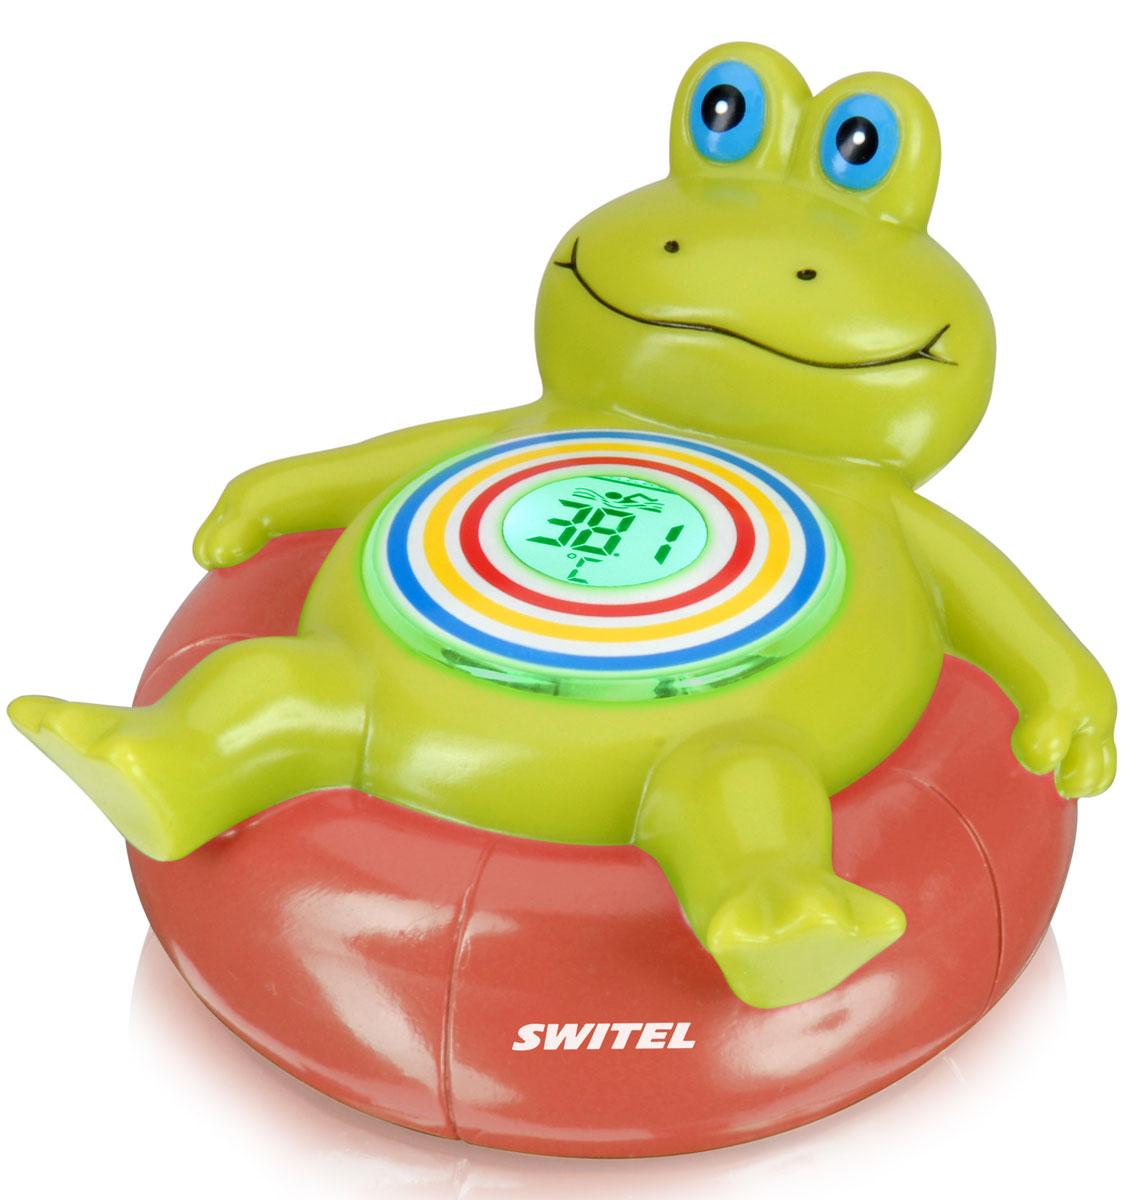 Switel Термометр для воды детский BC300 - Все для купания